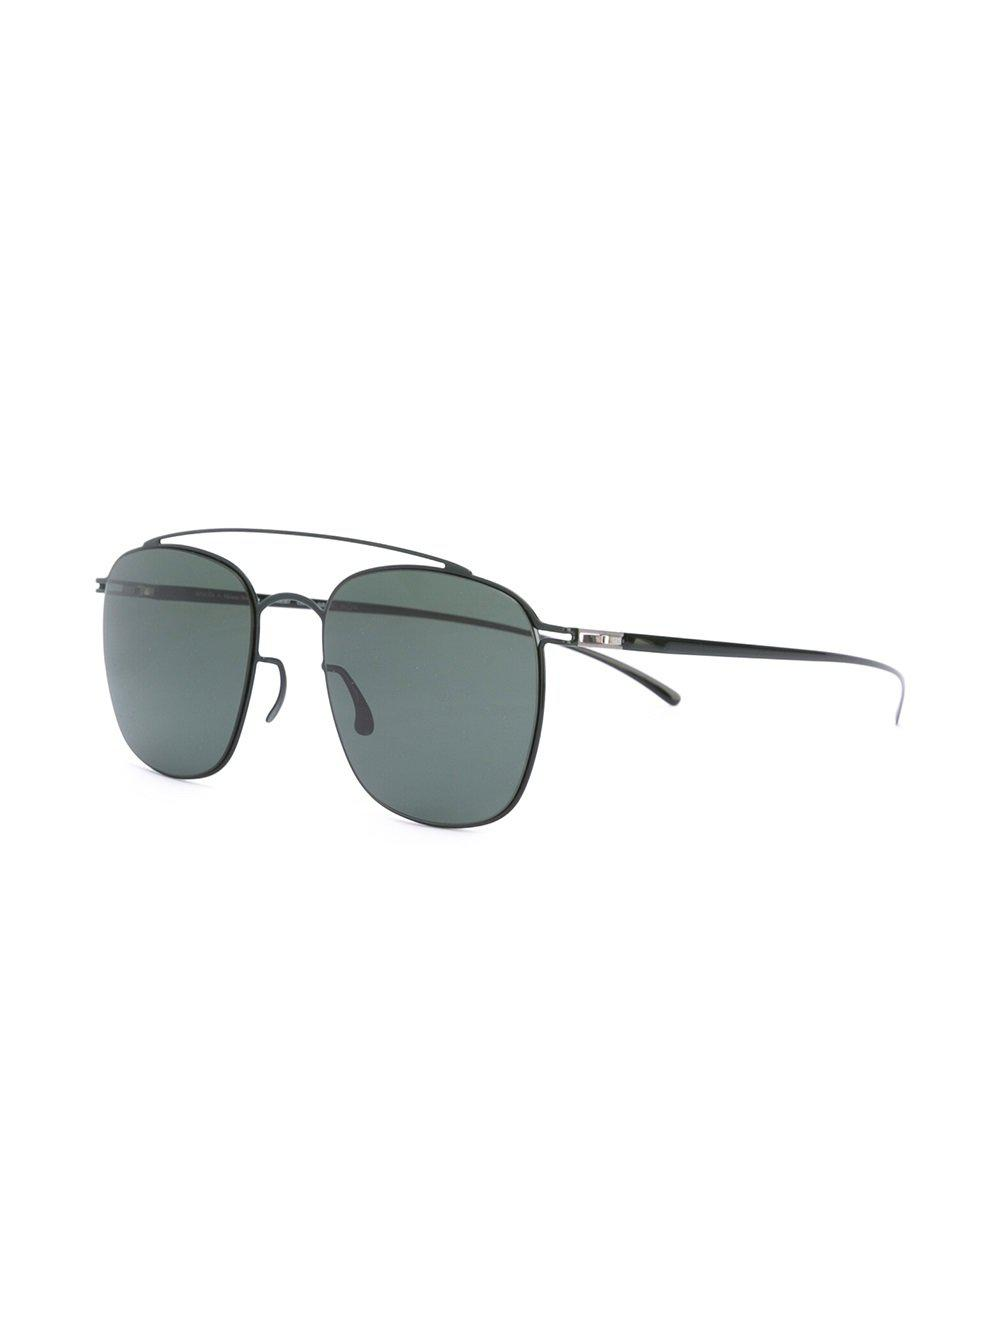 Mykita Maison Martin Margiela X Aviator Sunglasses in Green (Black)